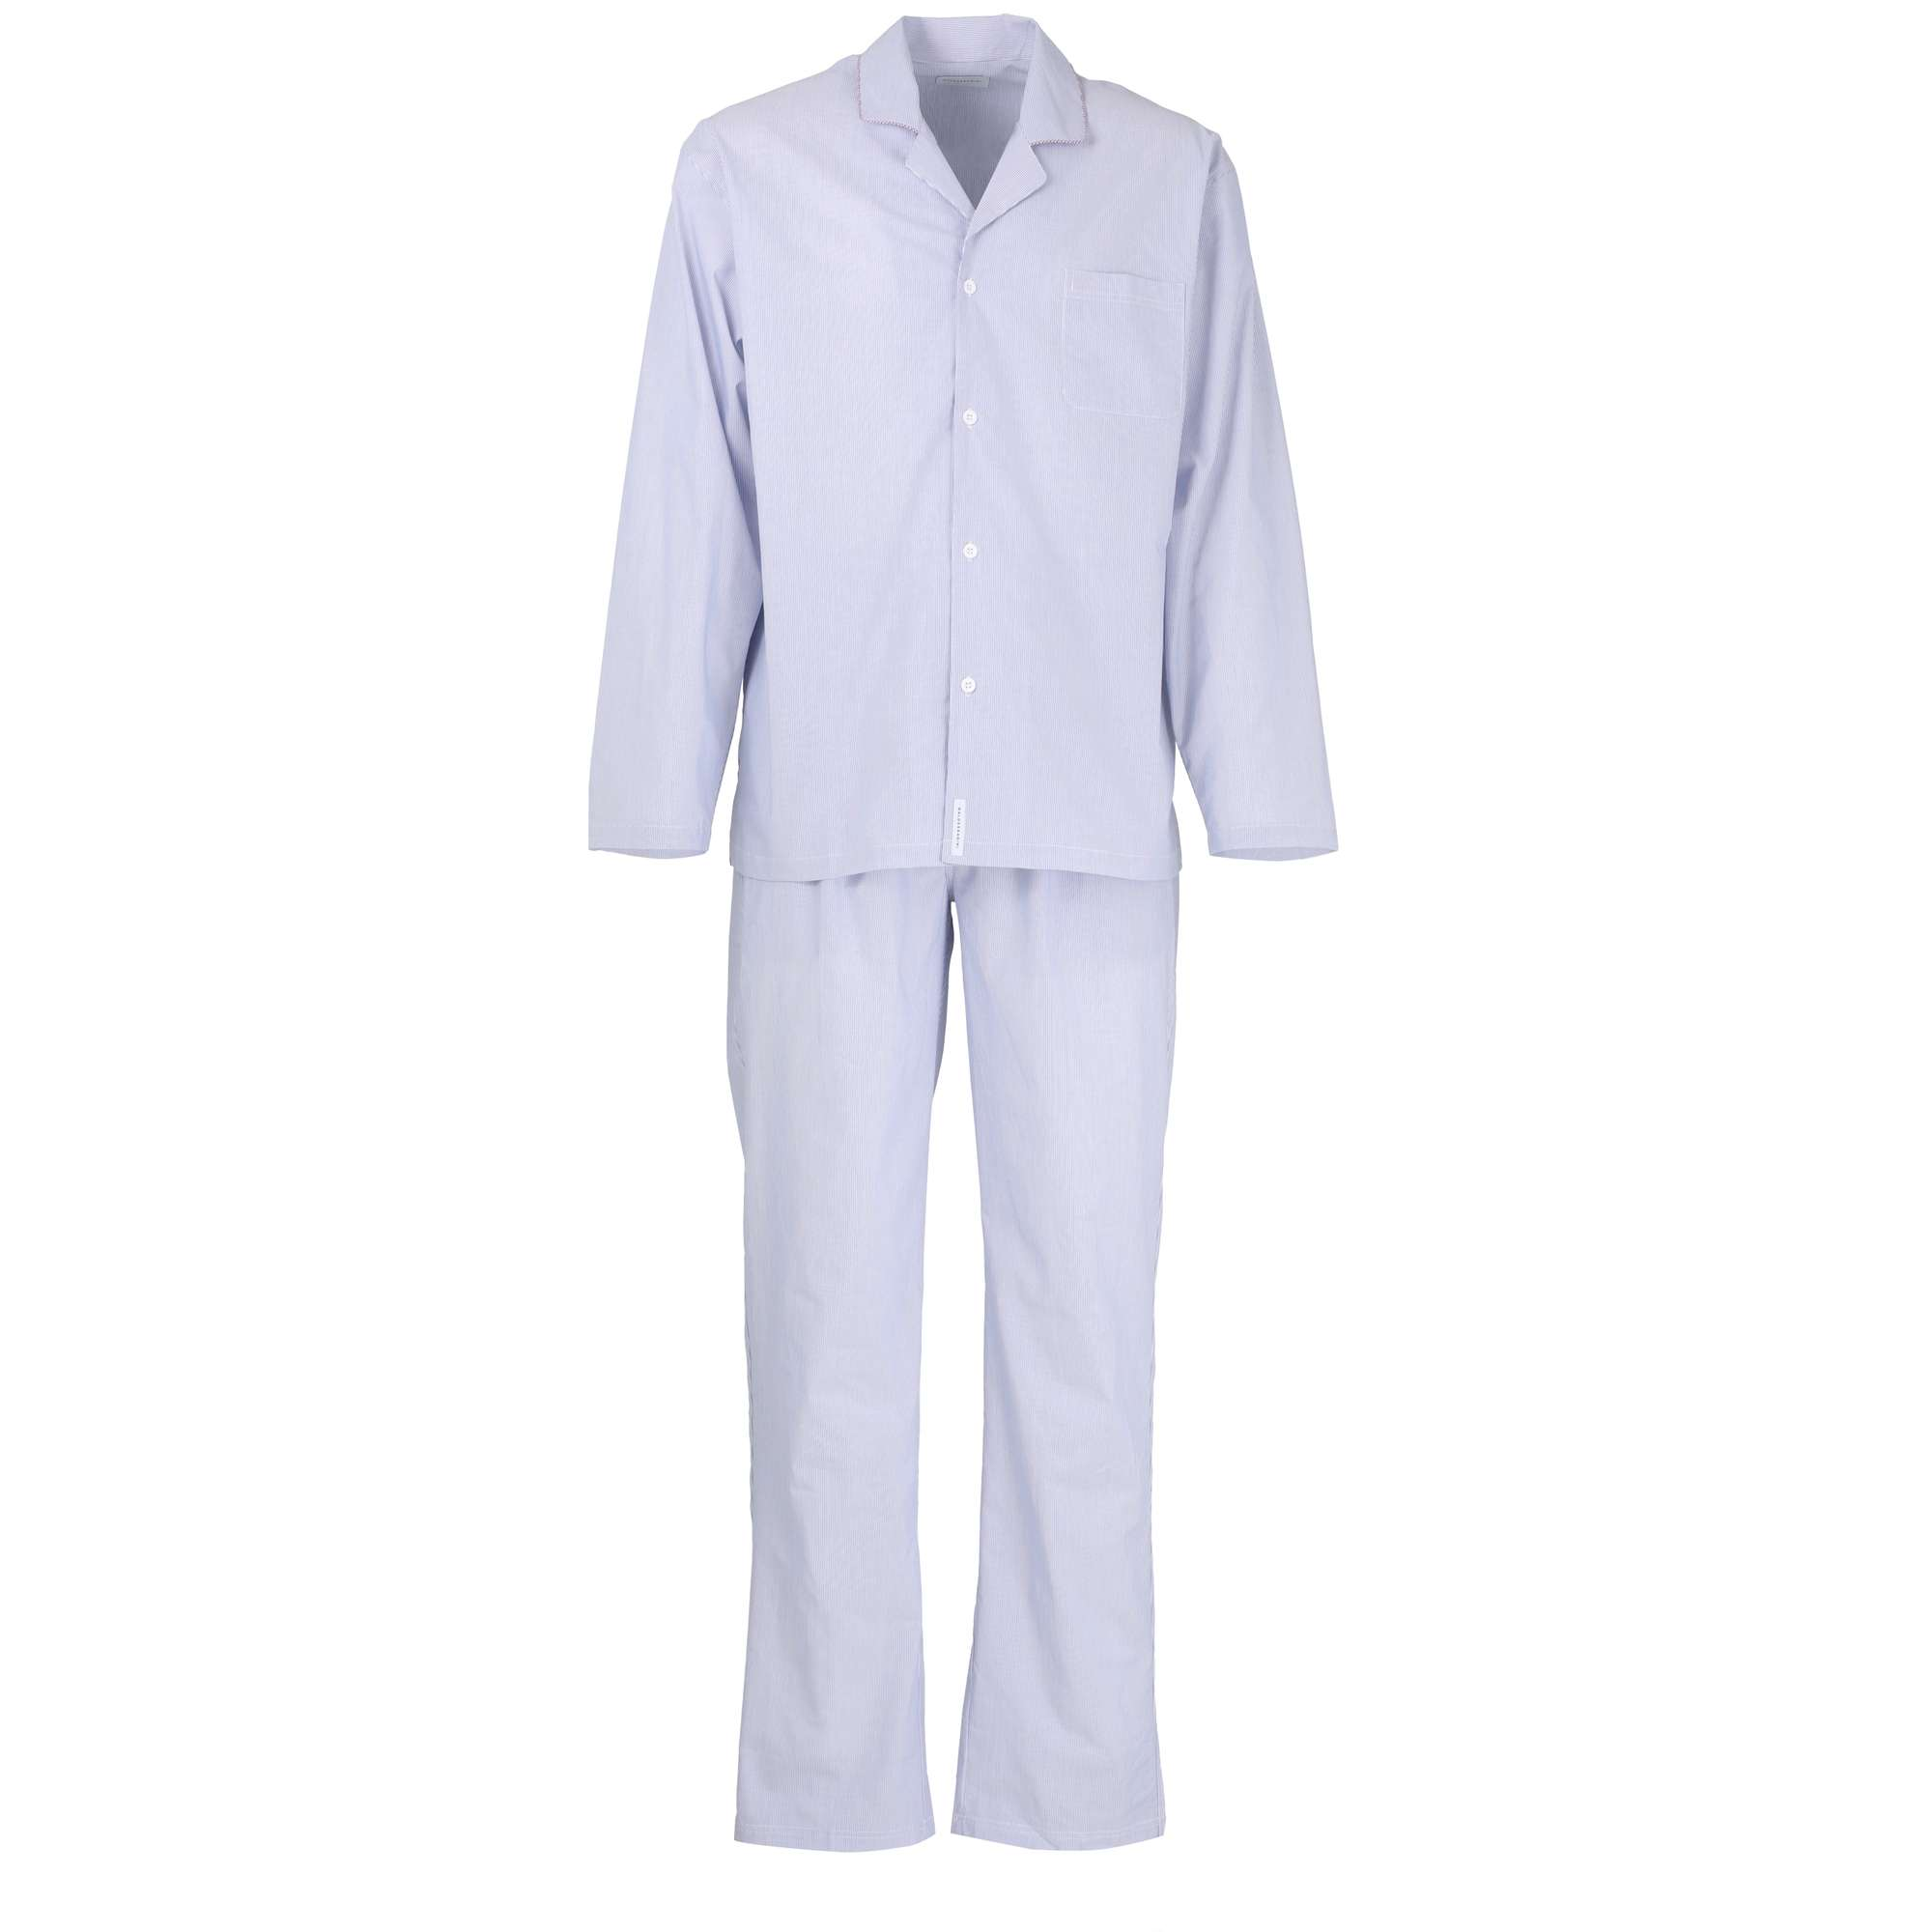 official photos 12c23 203d0 BALDESSARINI Herren Pyjama blau längsgestreift 1er Pack jetzt kaufen